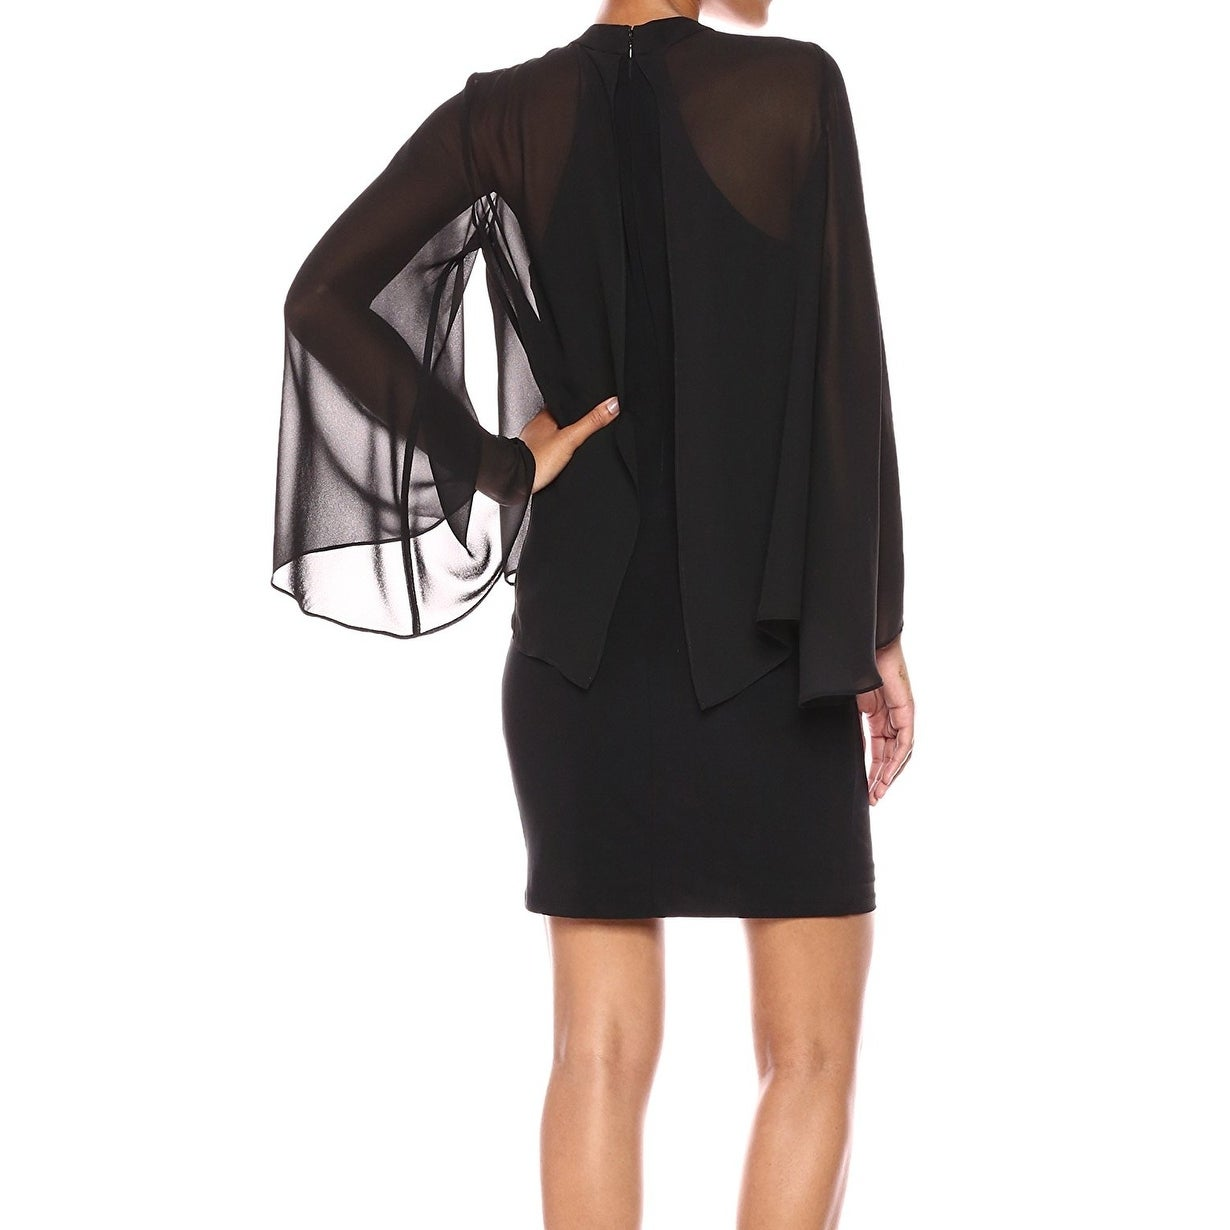 a22e8a9398d6 Shop Laundry by Shelli Segal Black Women s Size 8 Cutout Sheath ...